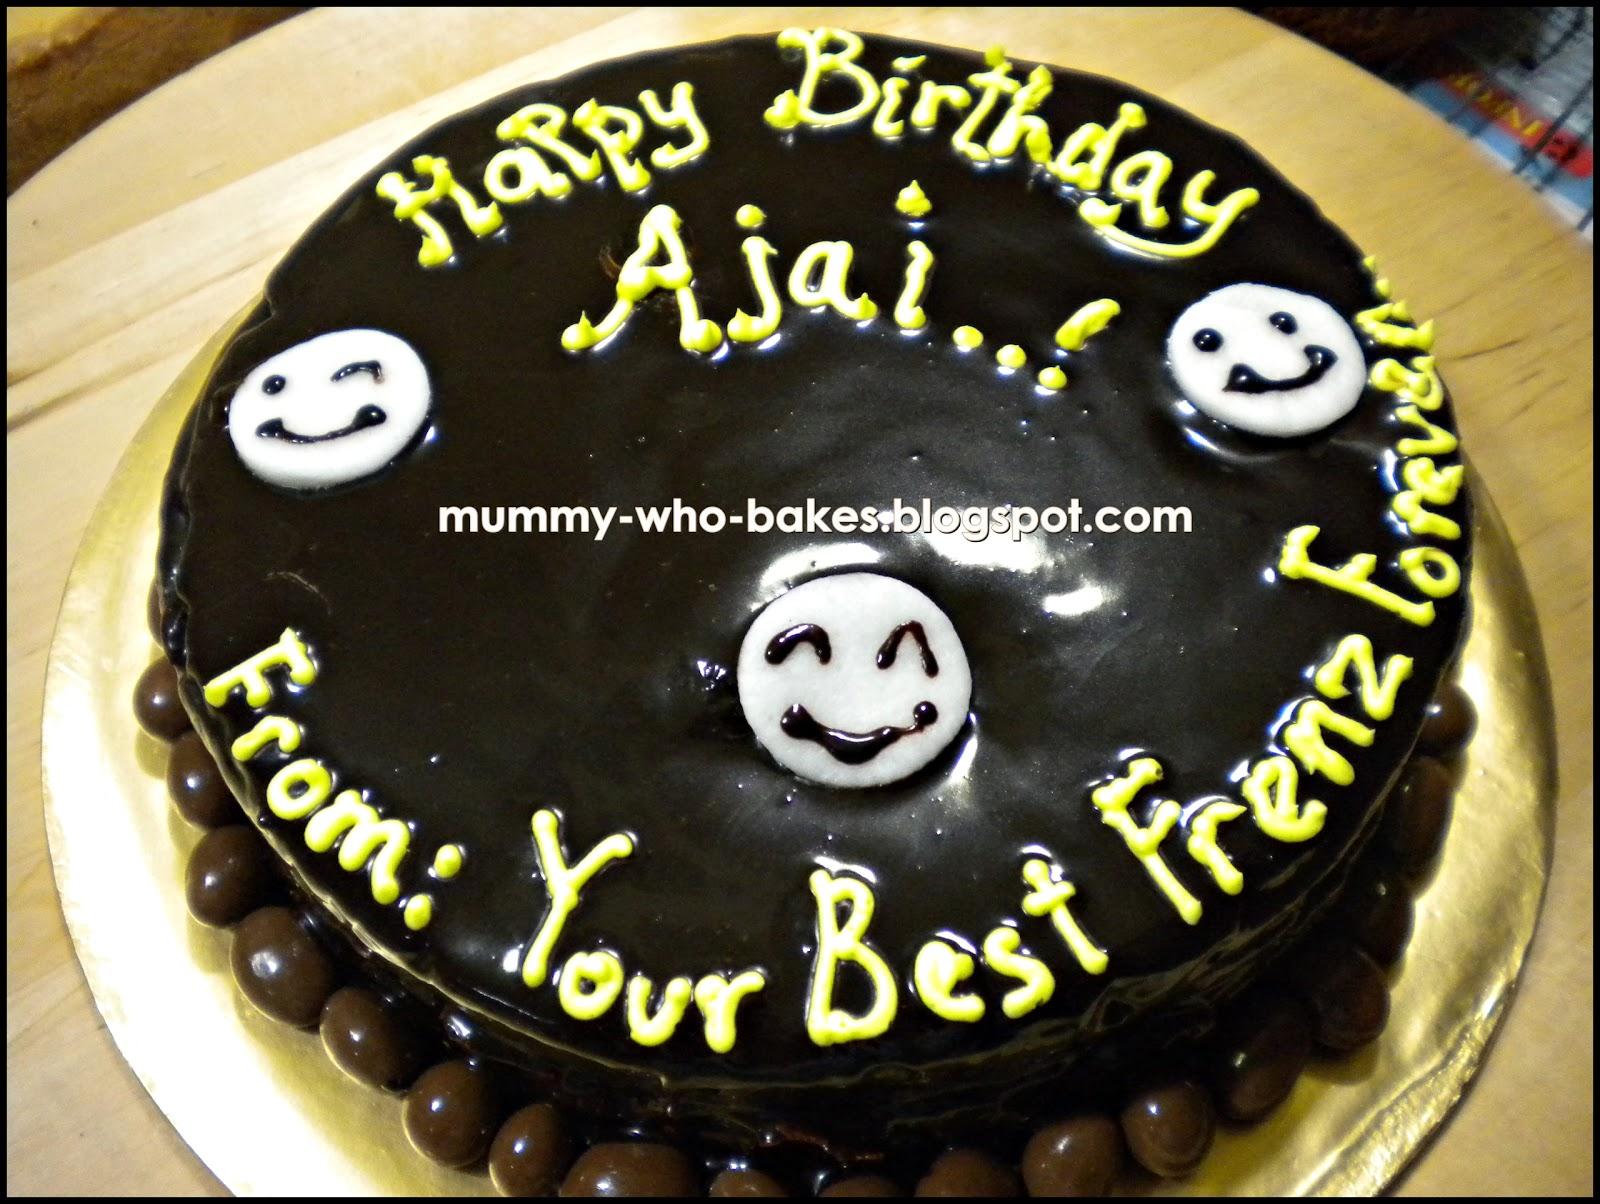 My Little Cupcakes Moist Mud Chocolate Birthday Cake for their